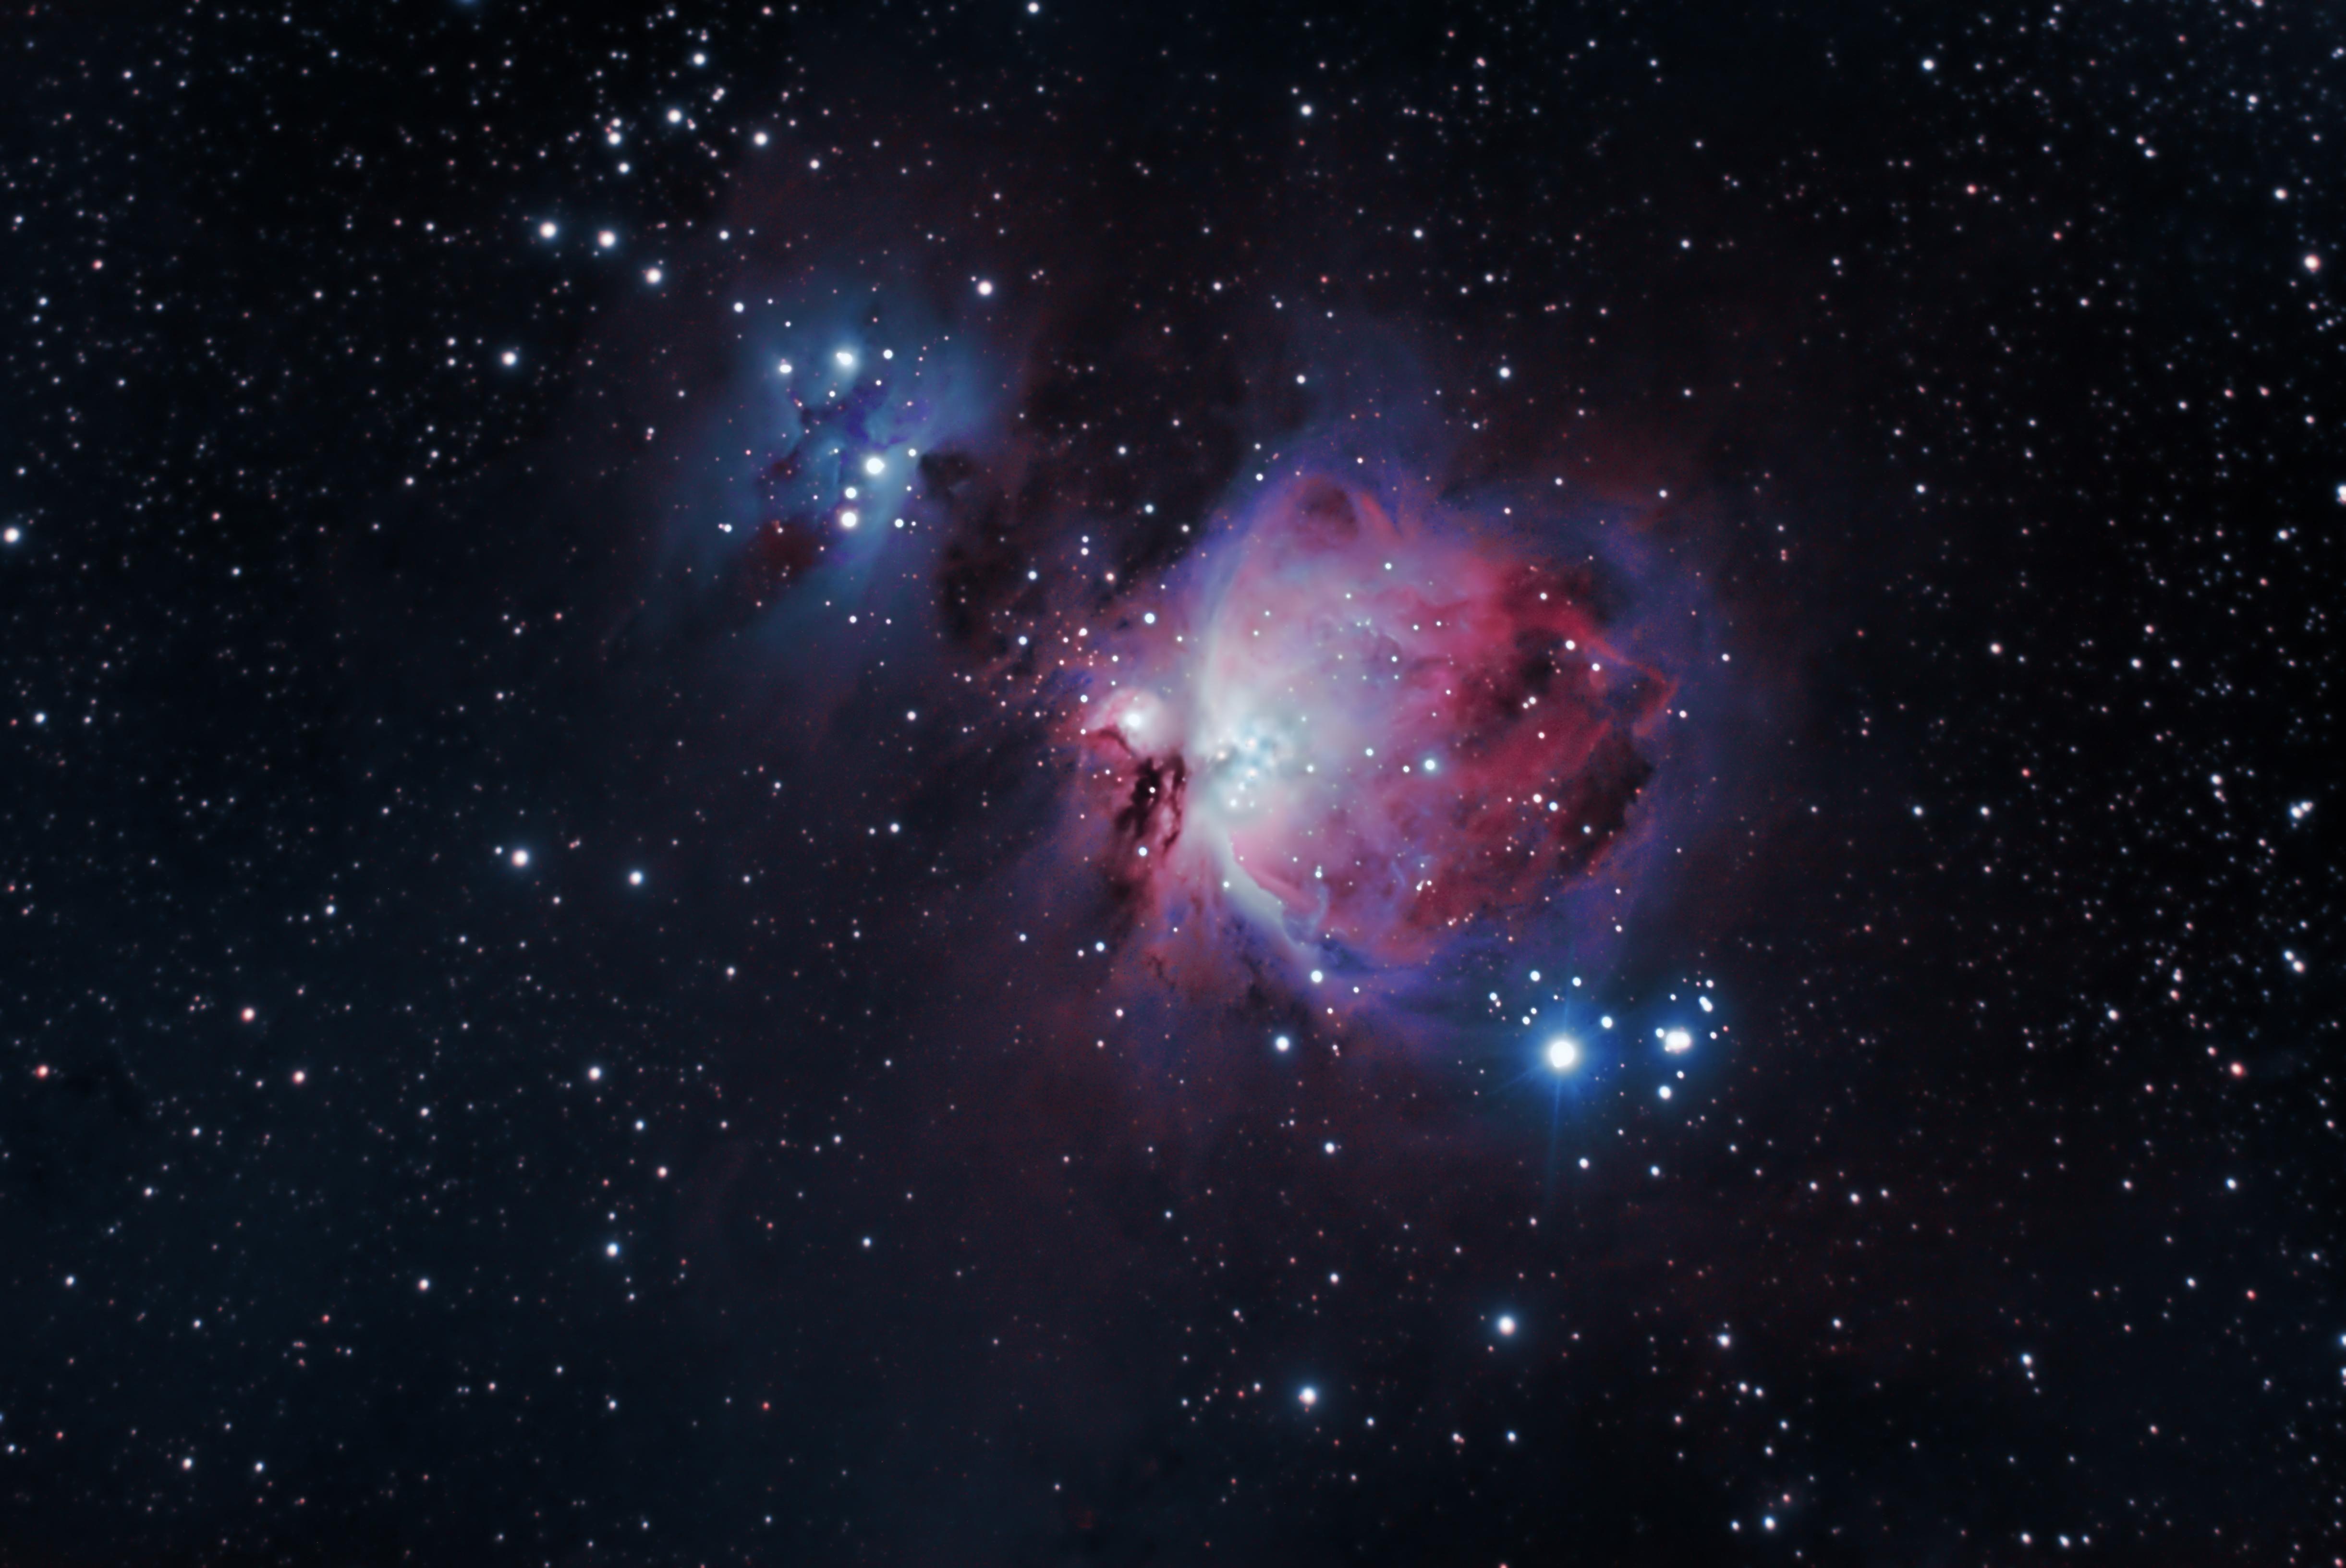 M42 The Orion Nebula | Orion nebula, Galaxies, Astronomy